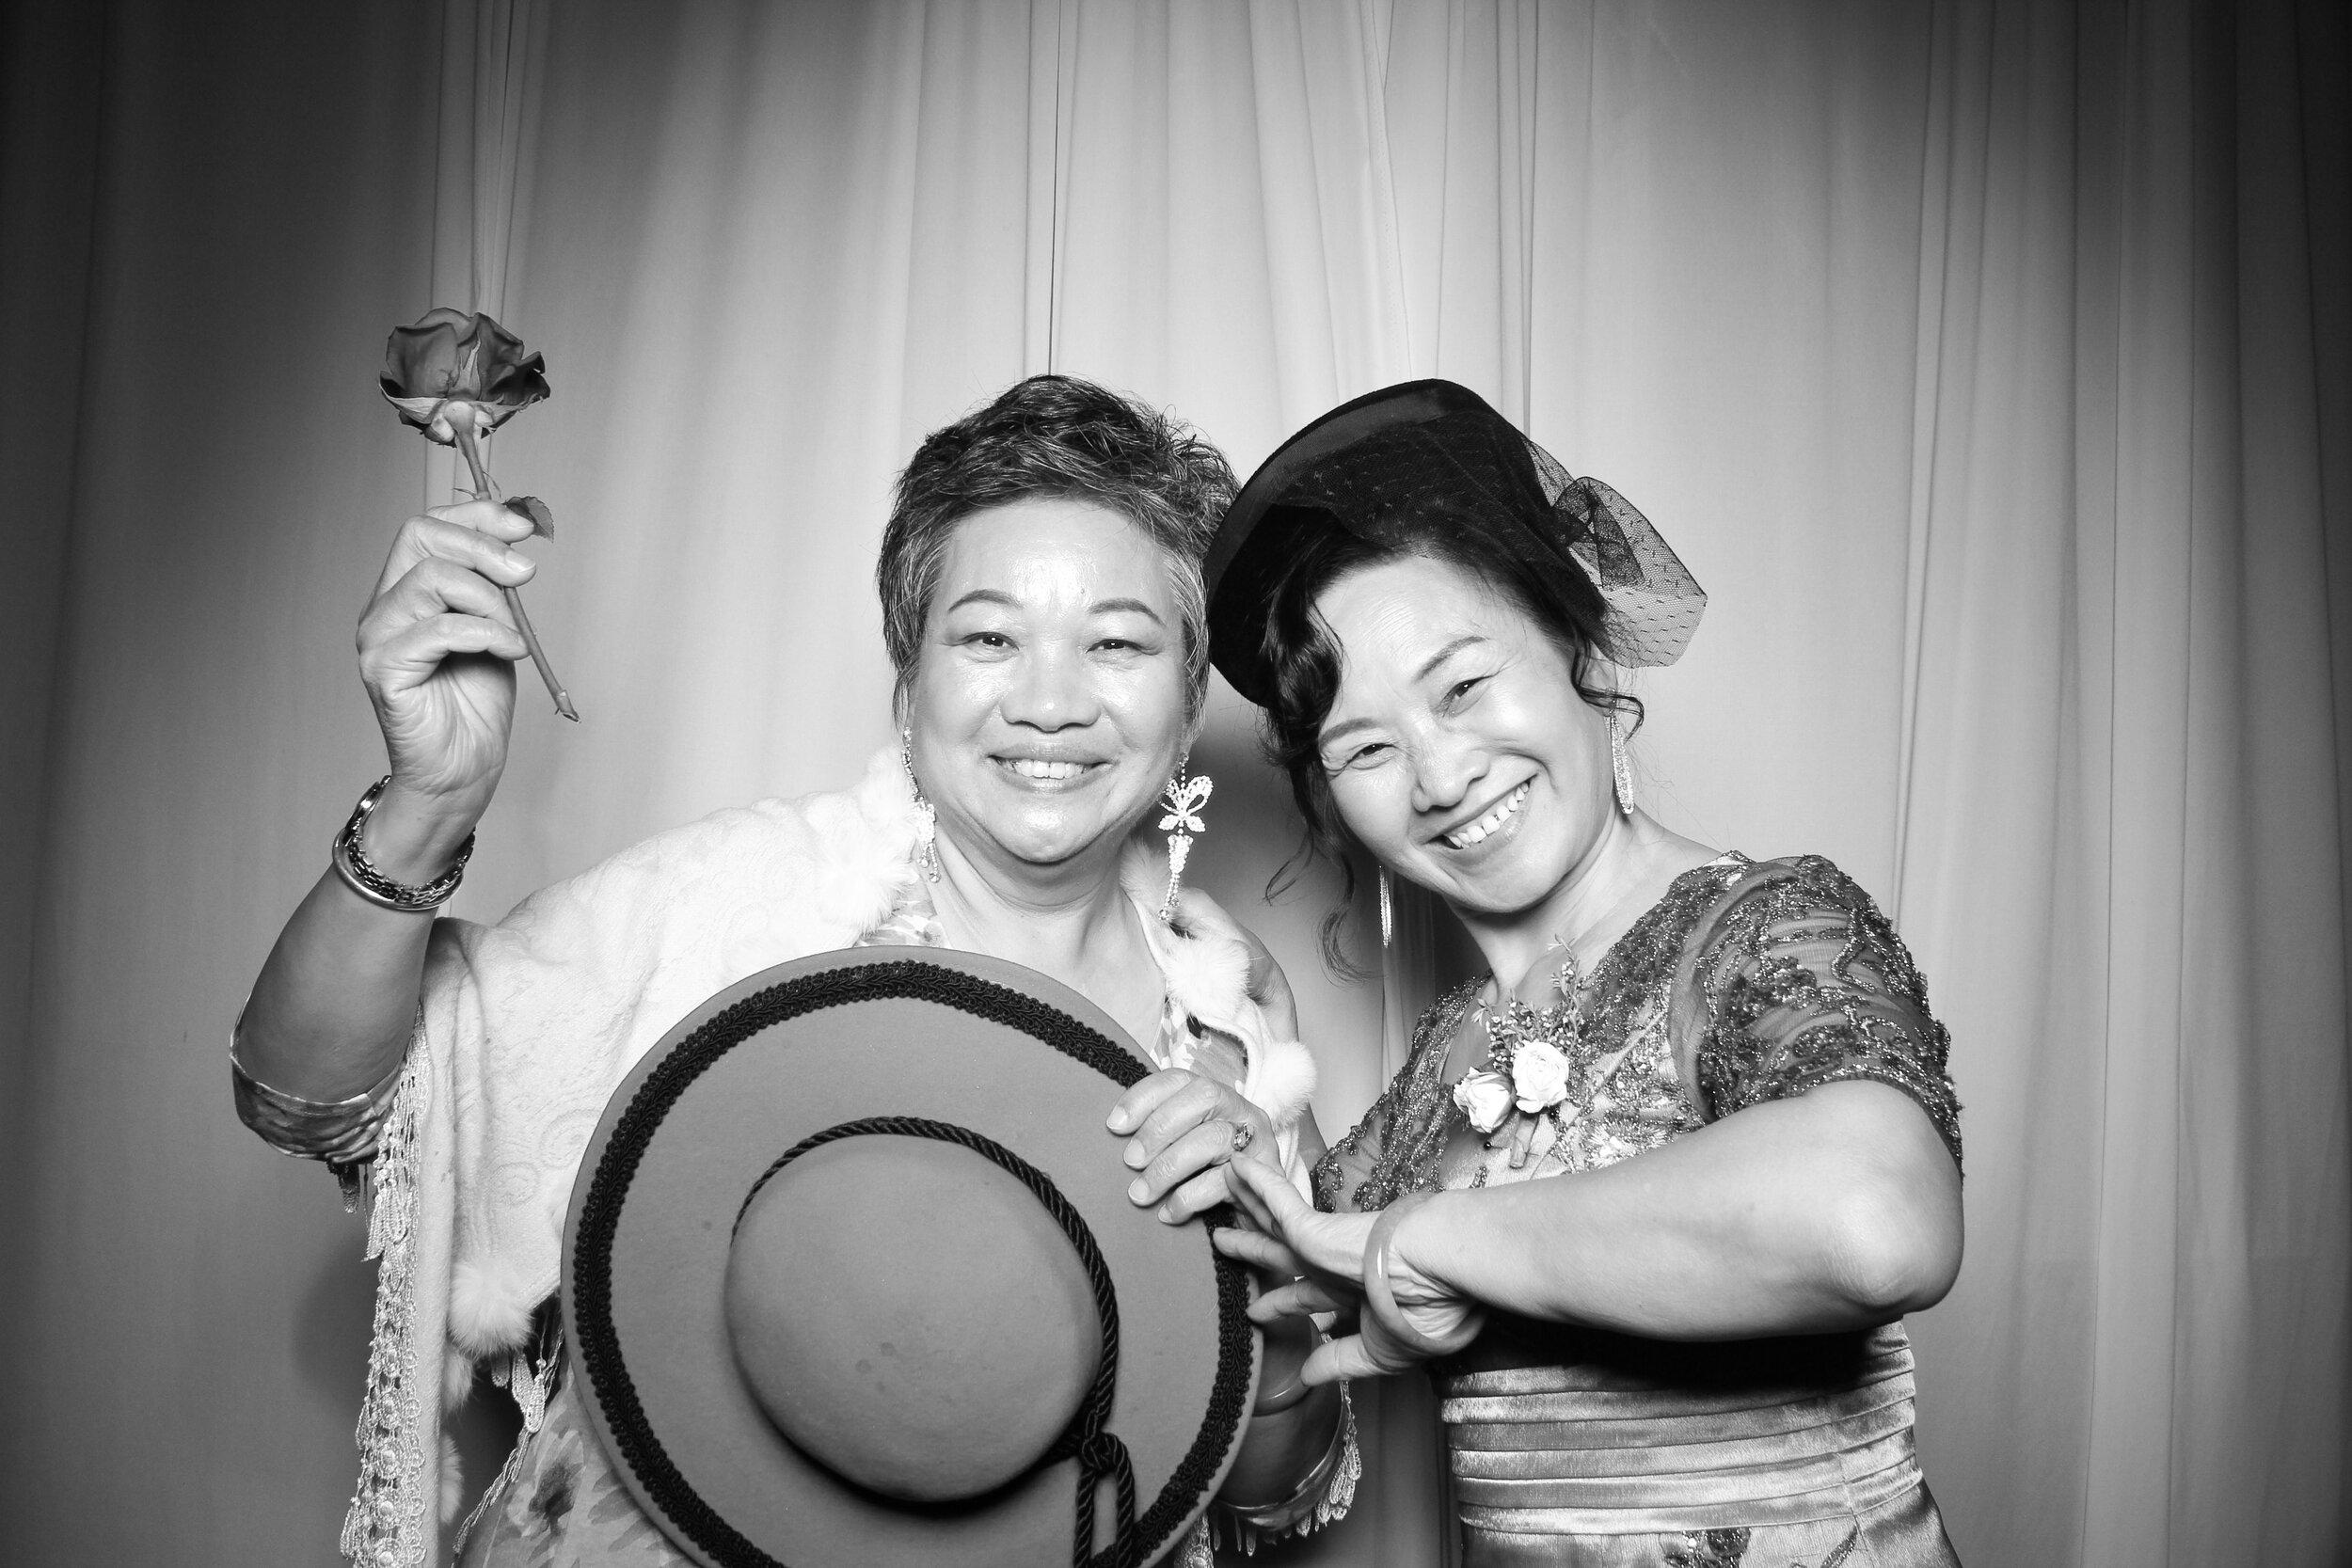 Cai_Restaurant_Chinatown_Chicago_Wedding_Photo_Booth_13.jpg